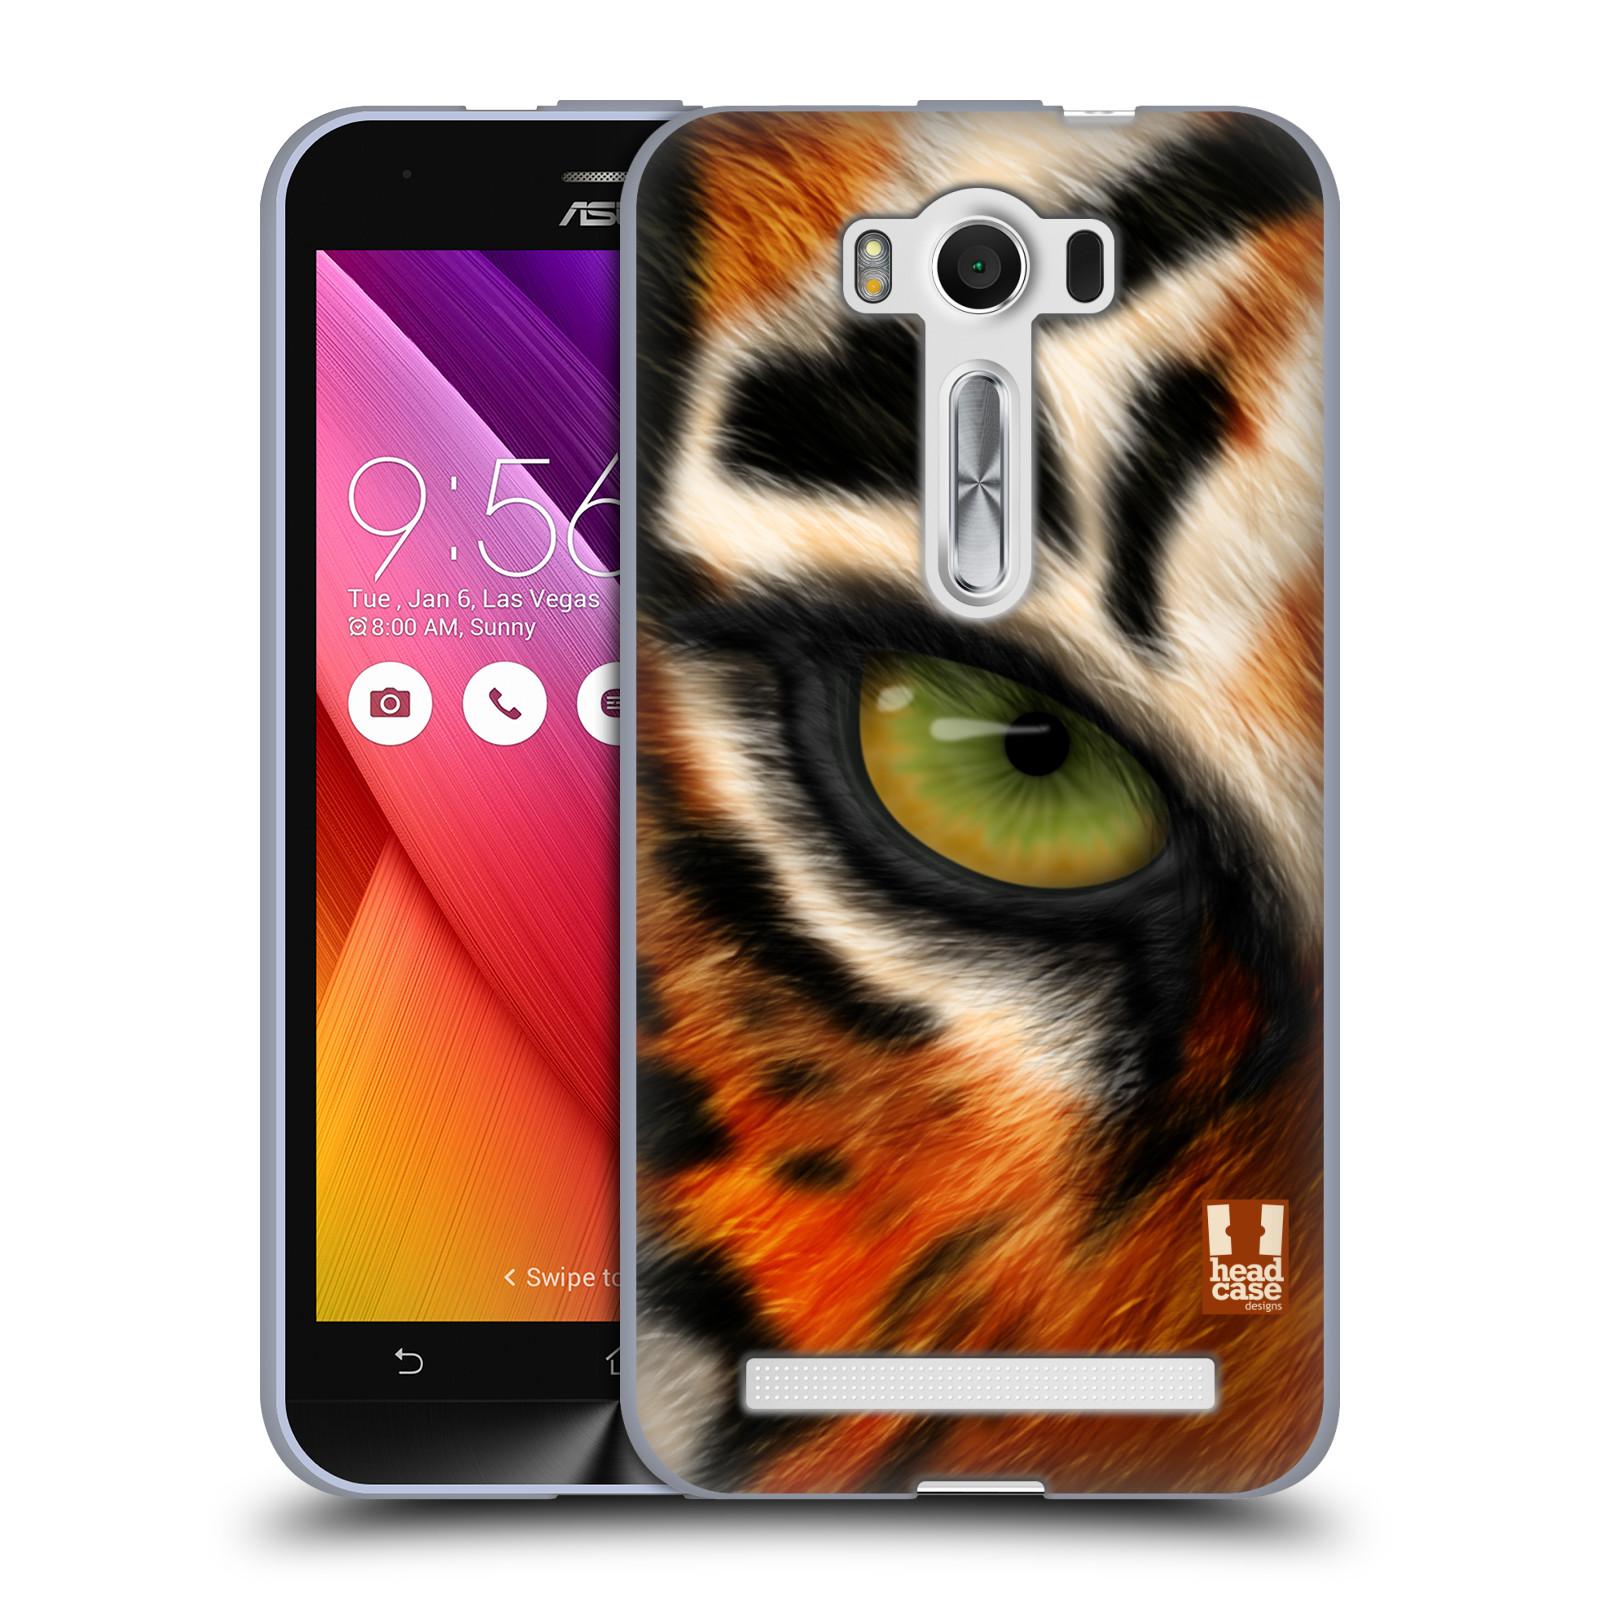 "HEAD CASE silikonový obal na mobil Asus Zenfone 2 LASER (ZE500KL s 5"" displejem) vzor pohled zvířete oko tygr"